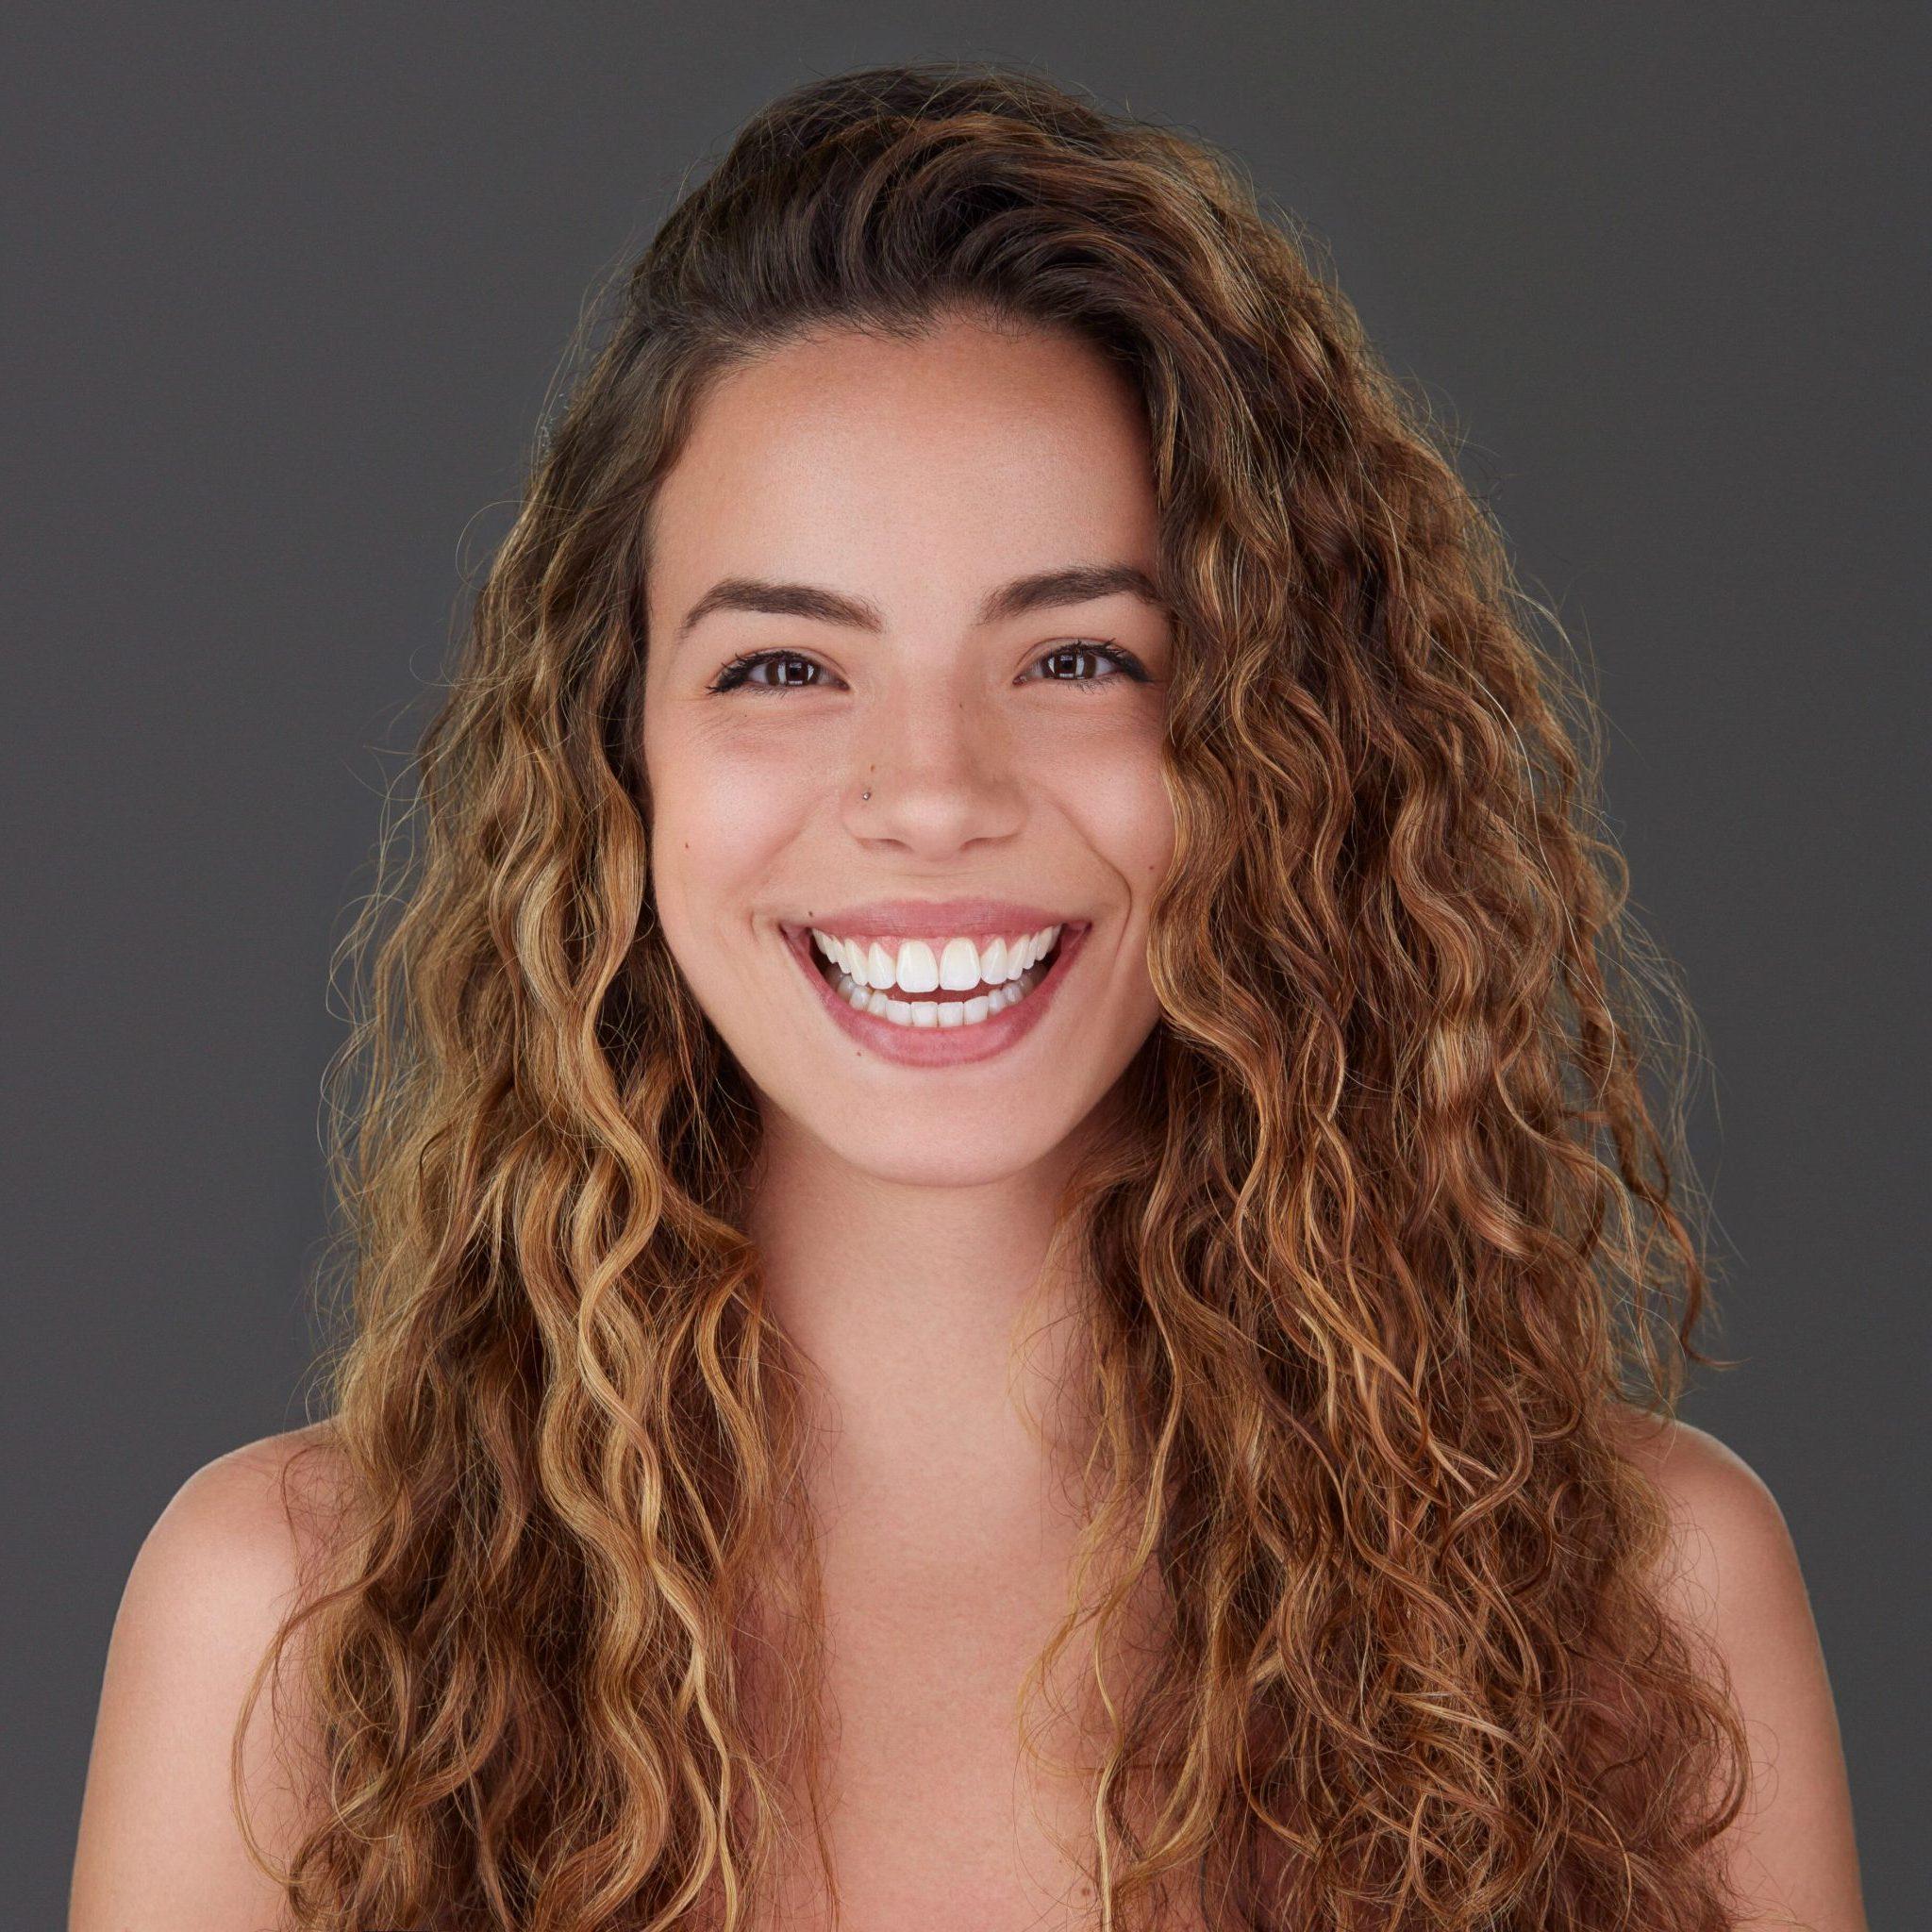 Zoe Kaplan